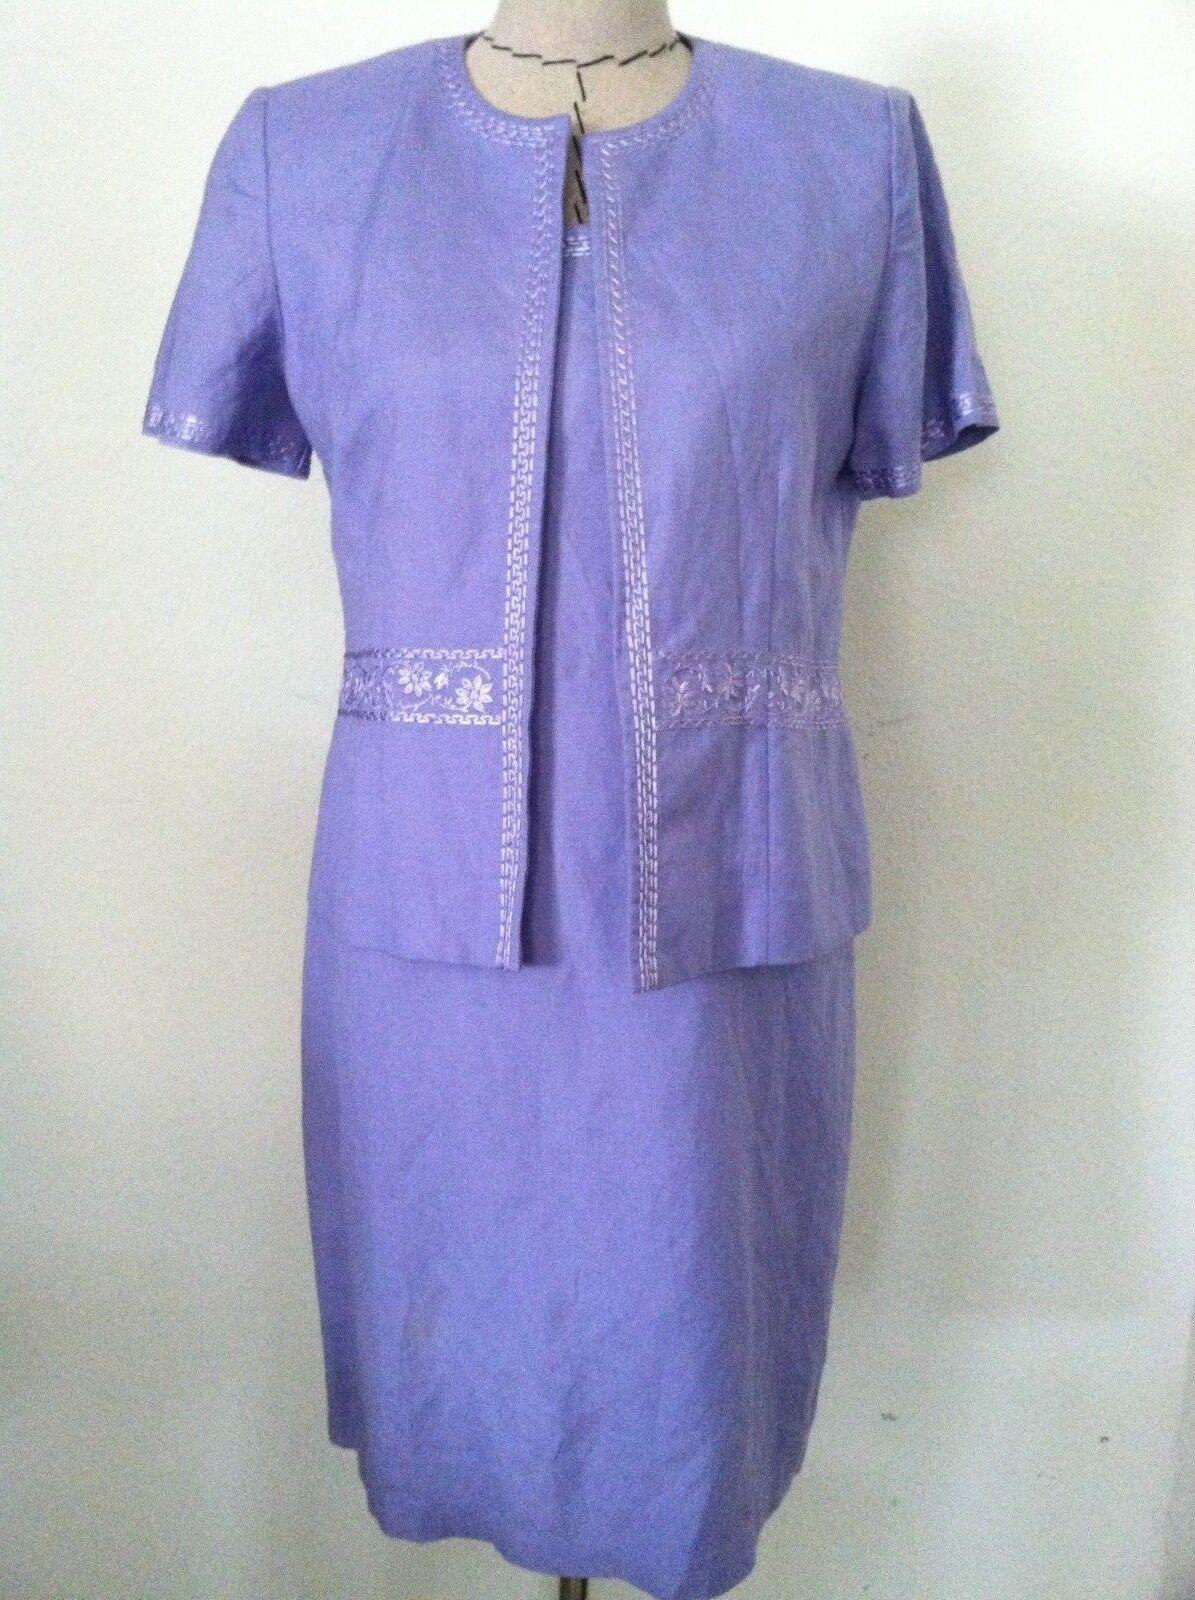 8P Jessica Howard dress purple lavender linen 2pc sheath floral embroidery size